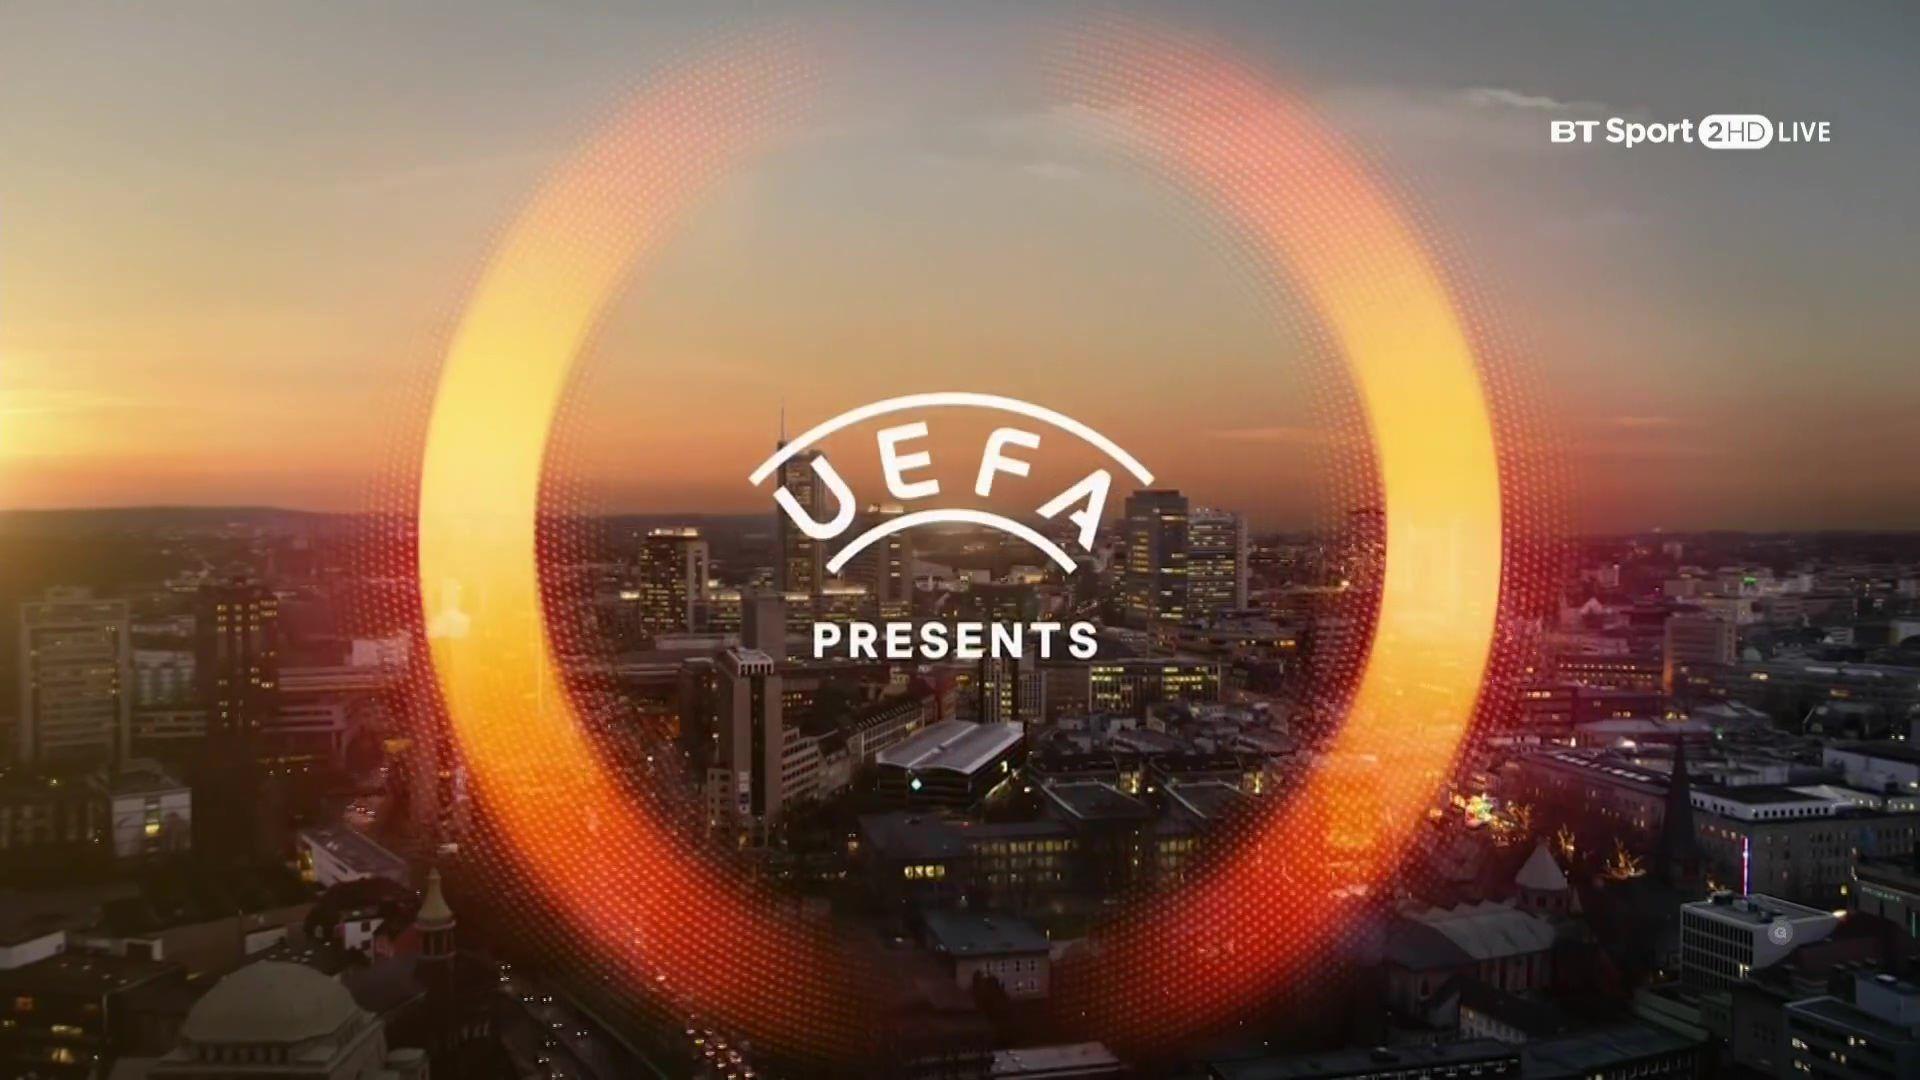 goals UEFA Europa League Highlights R16 2nd leg 15/03